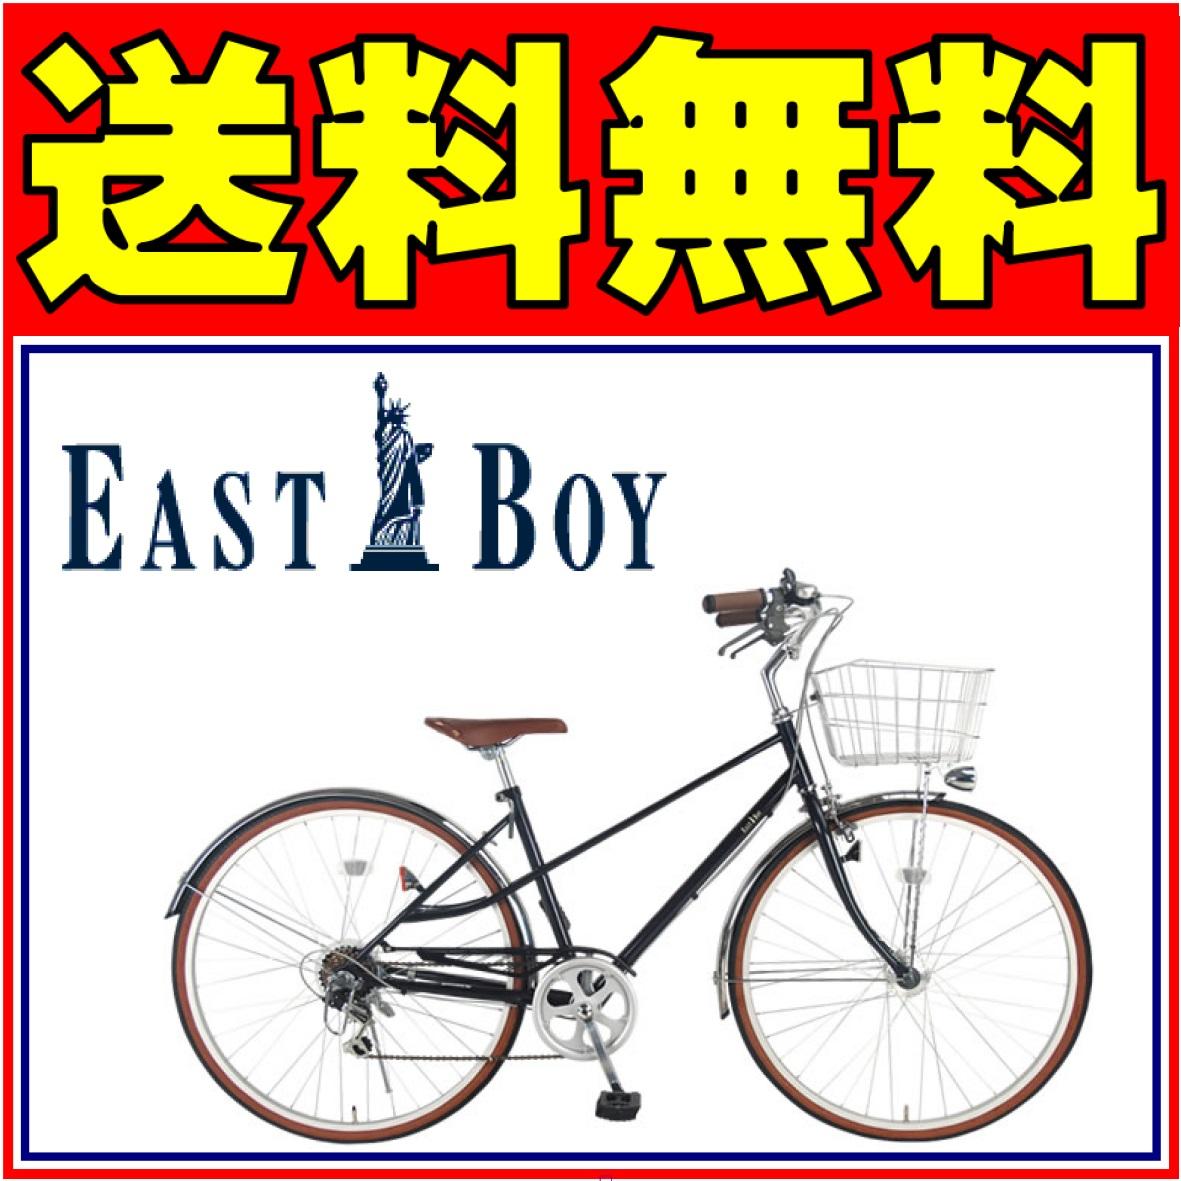 EASTBOY イーストボーイ 自転車 シティサイクル ネイビー 女子高生、女子中学生の通学に最適 クラシックスポーツ 外装6段ギア シティ車 27インチ LEDオートライト イーストボーイ 自転車